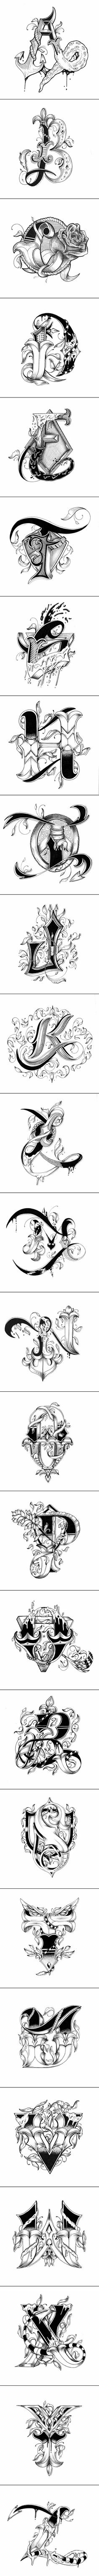 Best Lettering Design Alphabet - Luxury Best Lettering Design Alphabet , Letter and Symbol Misrecognition In Highly Legible Typefaces for Calligraphy Letters, Typography Letters, Alphabet Fonts, Alphabet Letters Design, Alphabet Art, Graffiti Lettering, Lettering Design, Graffiti Alphabet, Creative Lettering